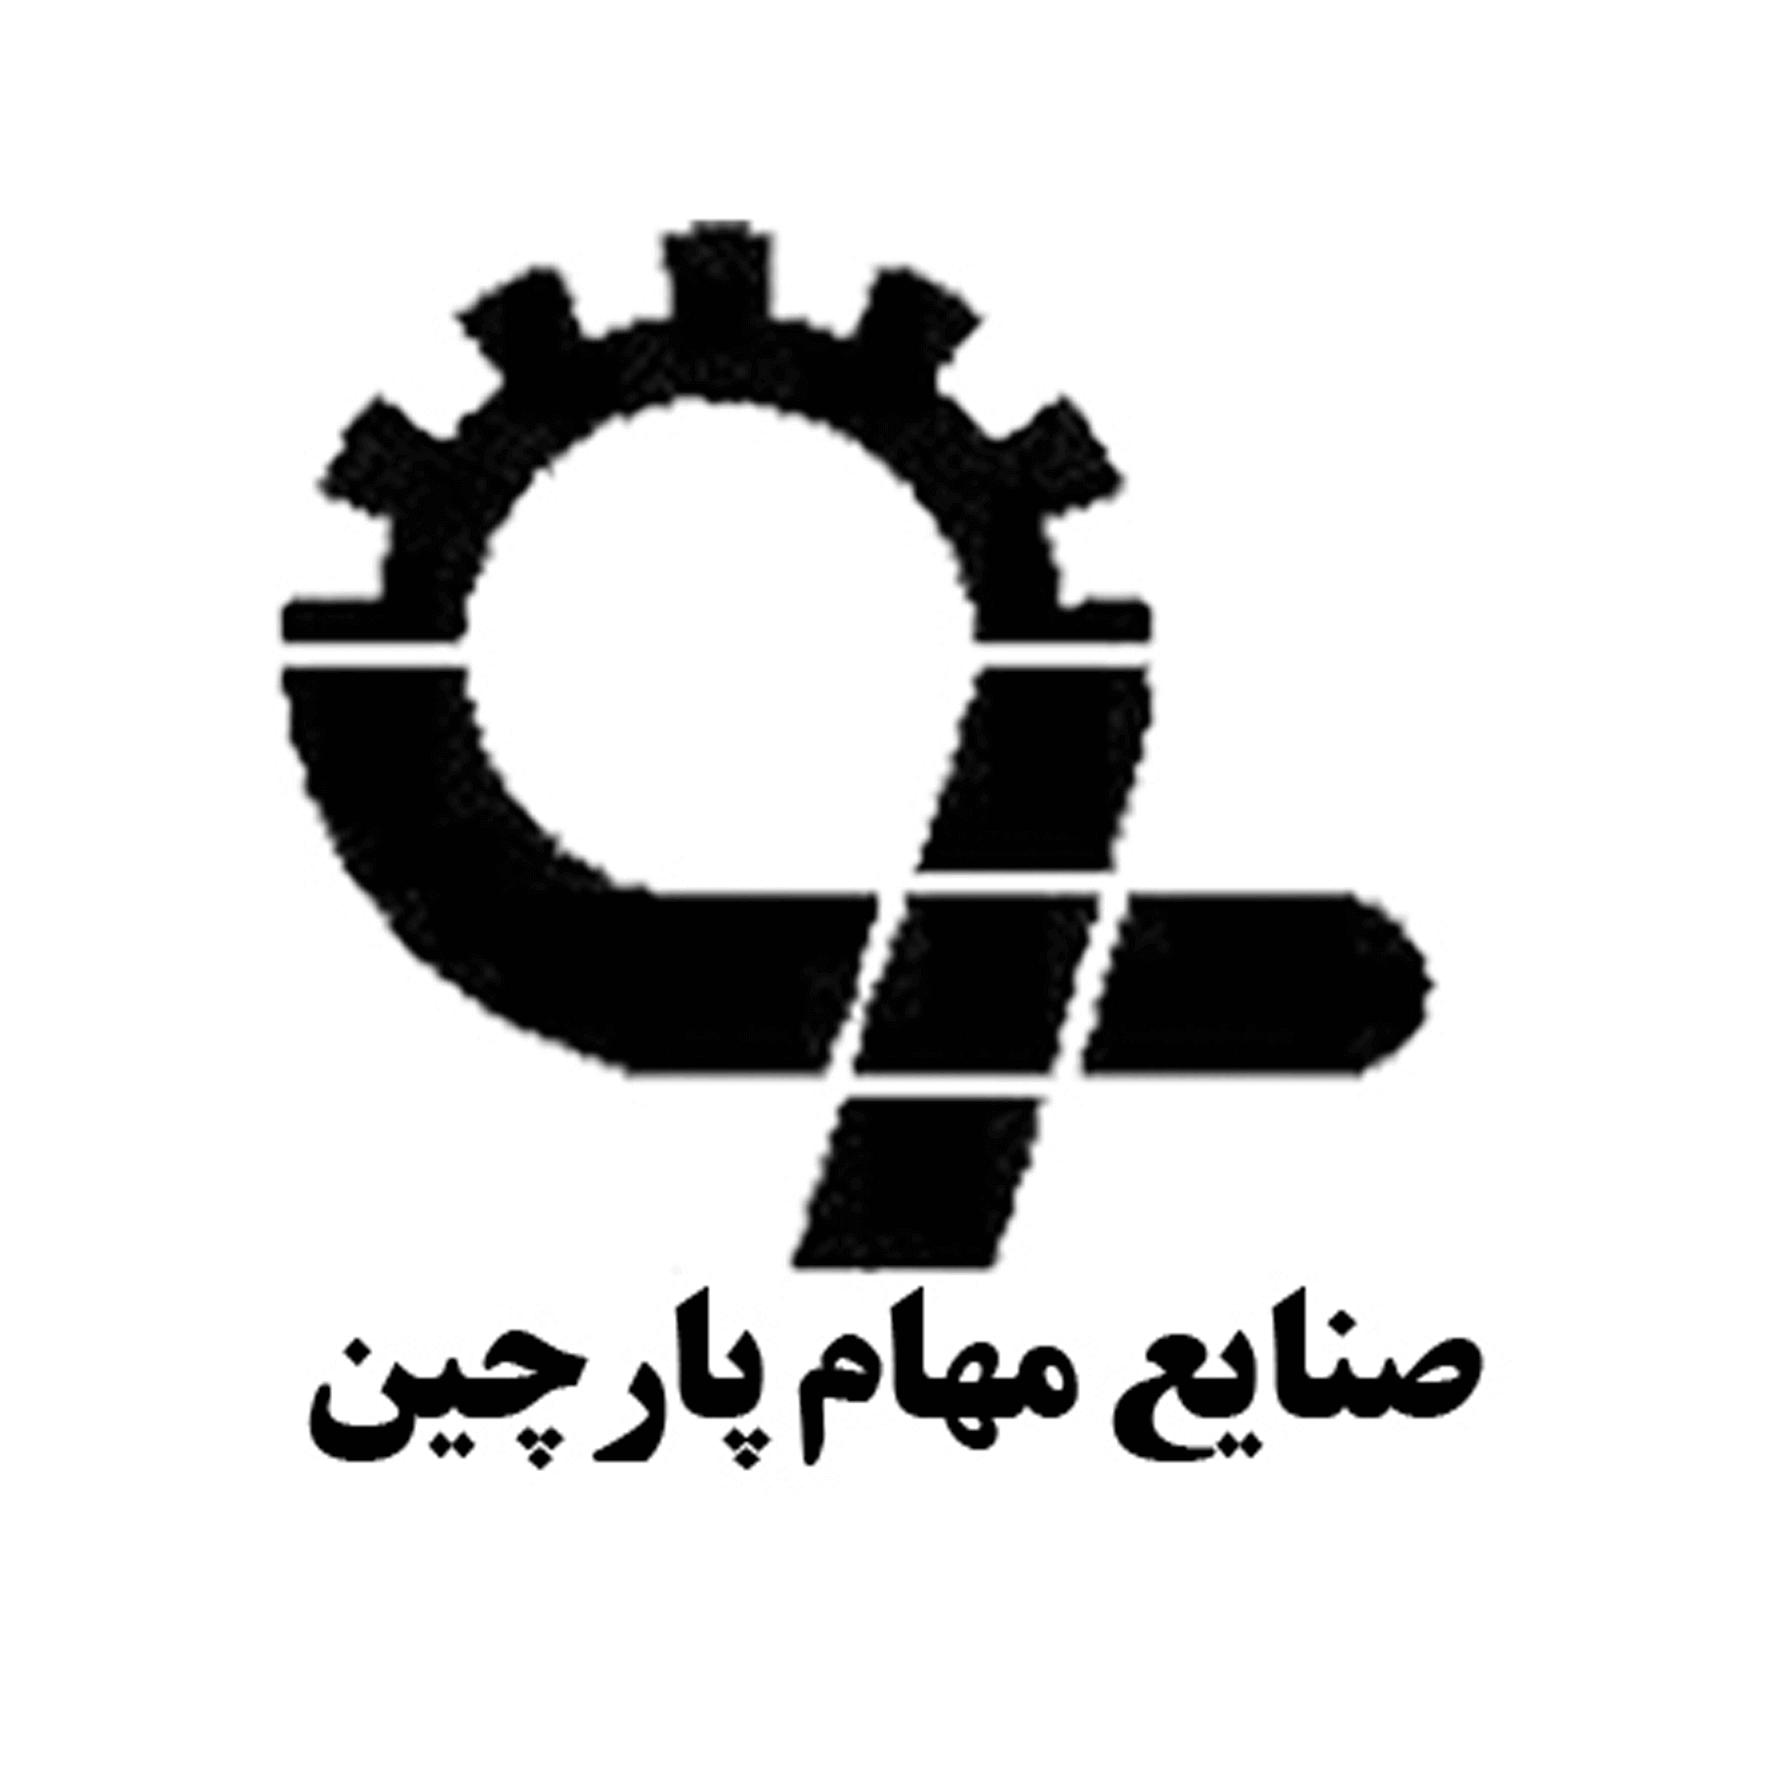 صنایع مهام پارچین